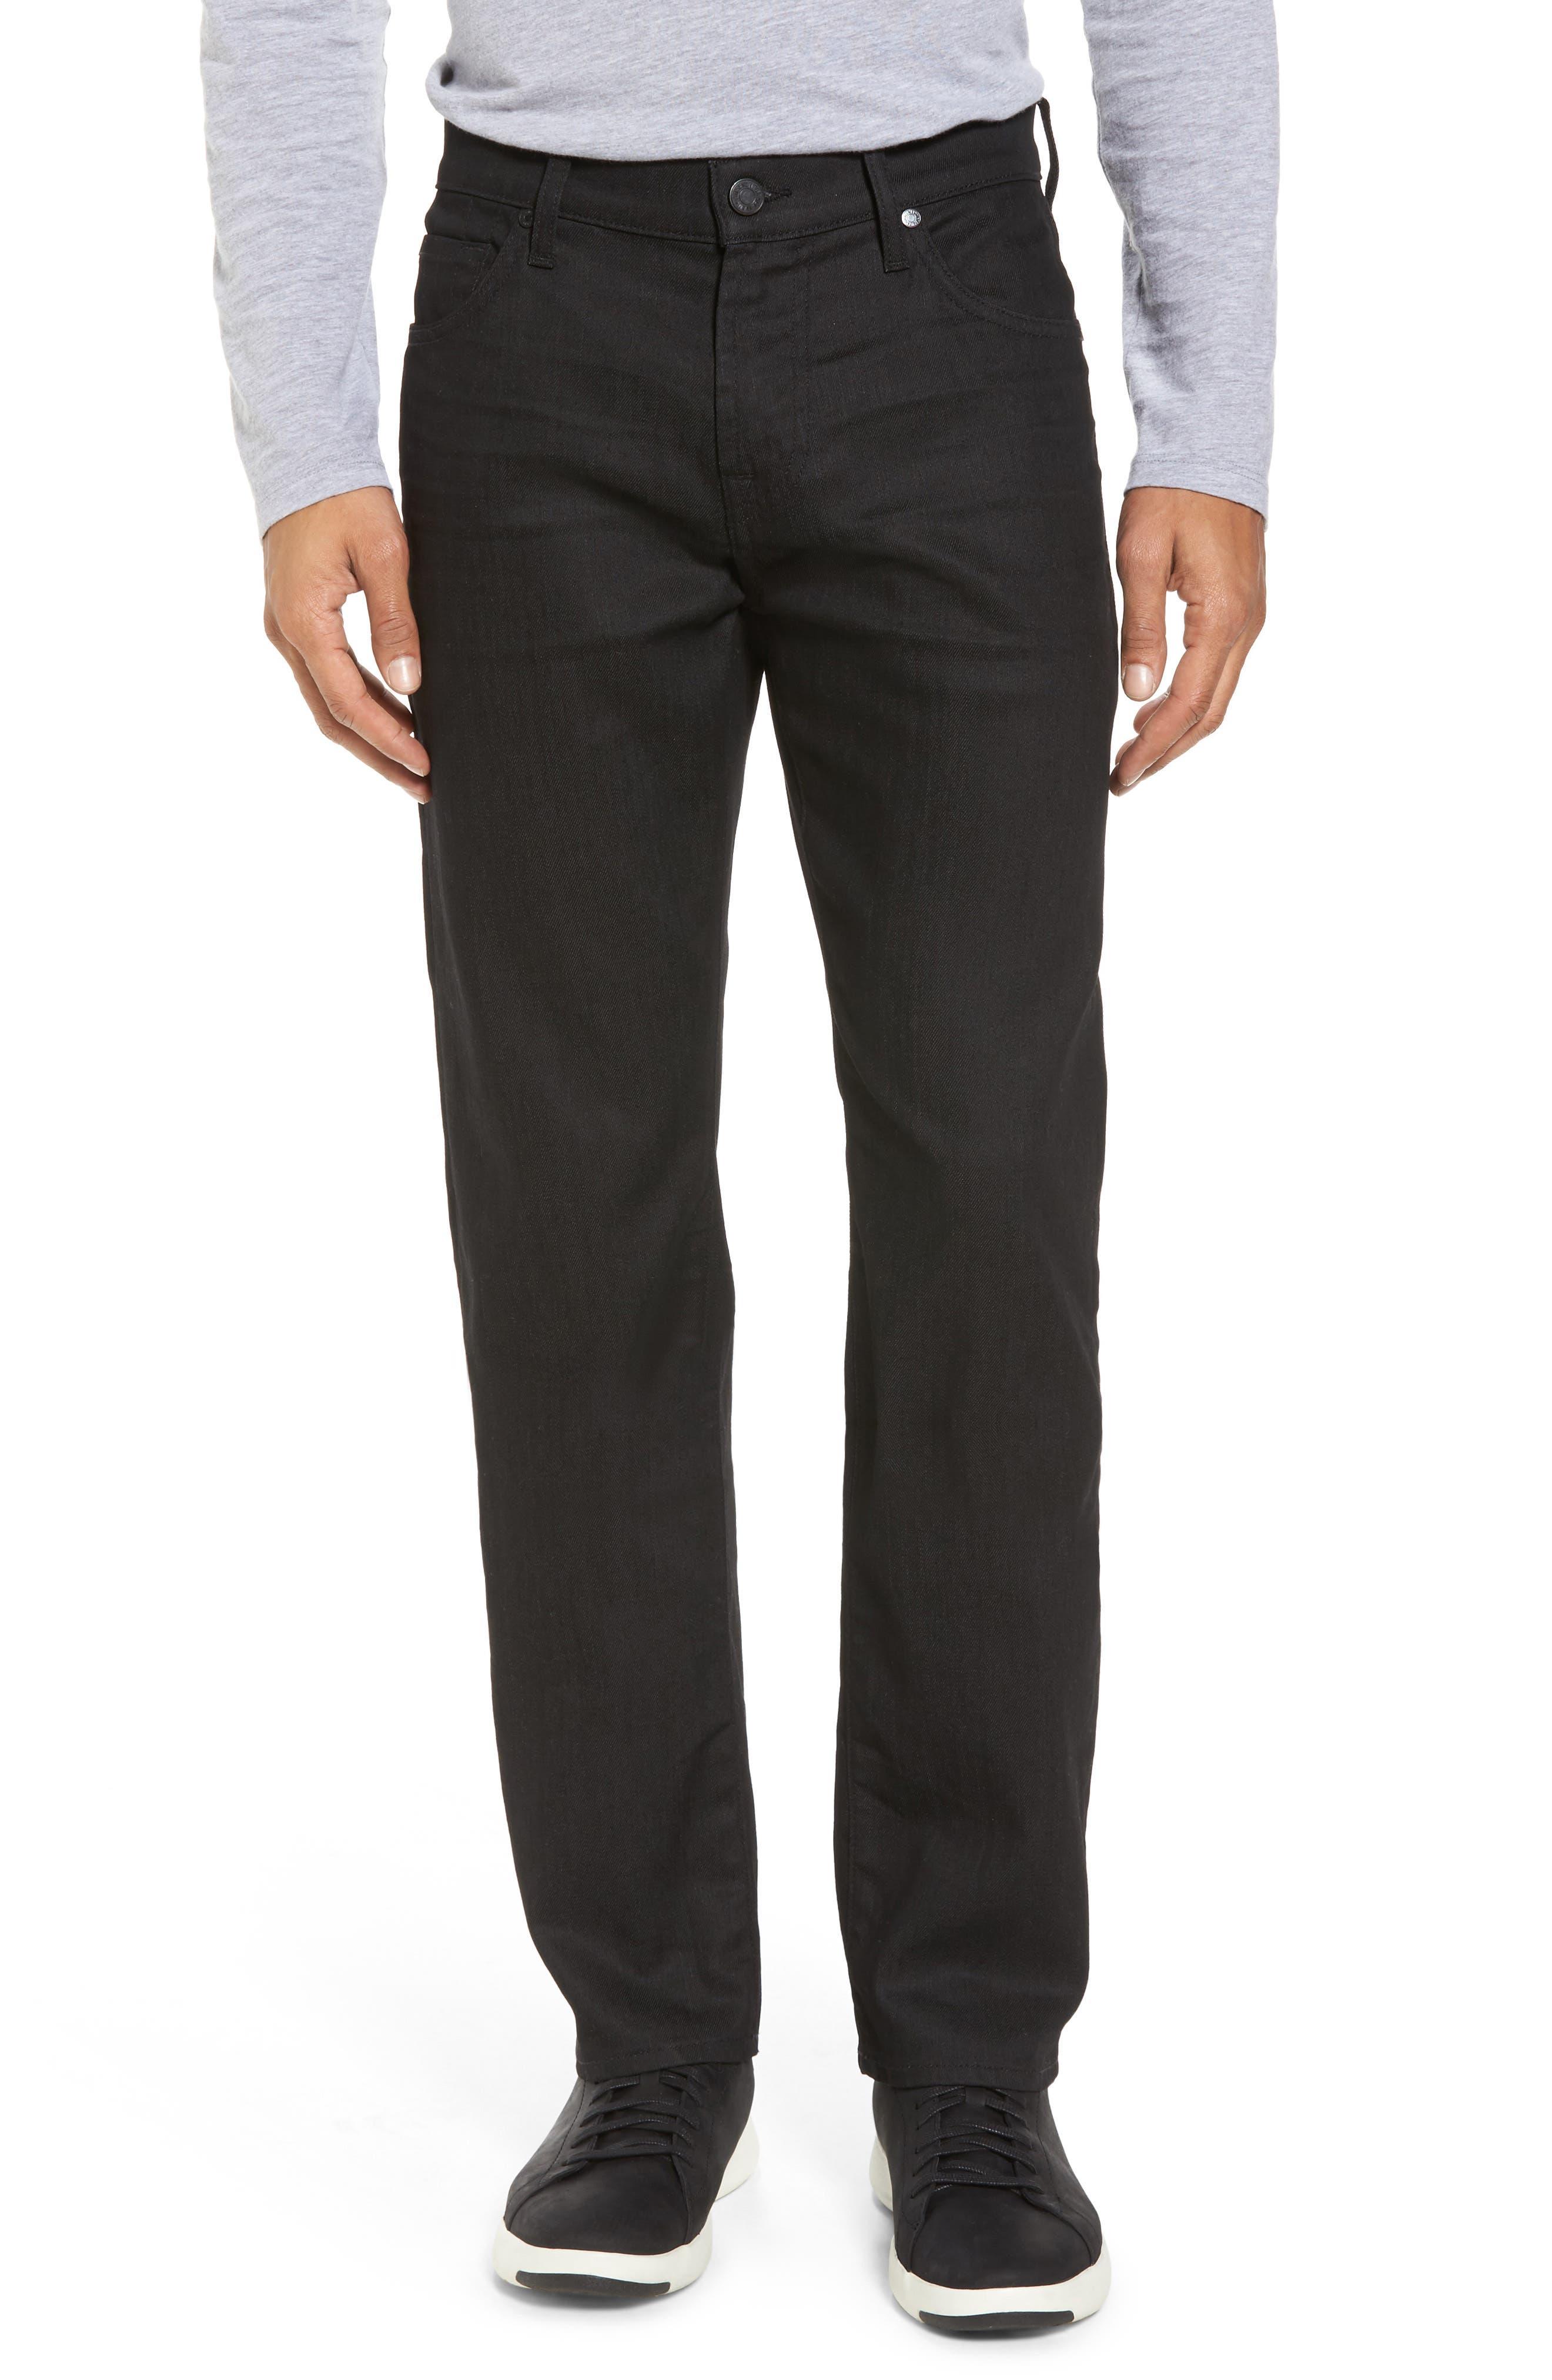 Airweft - Slimmy Slim Fit Jeans,                         Main,                         color, 004